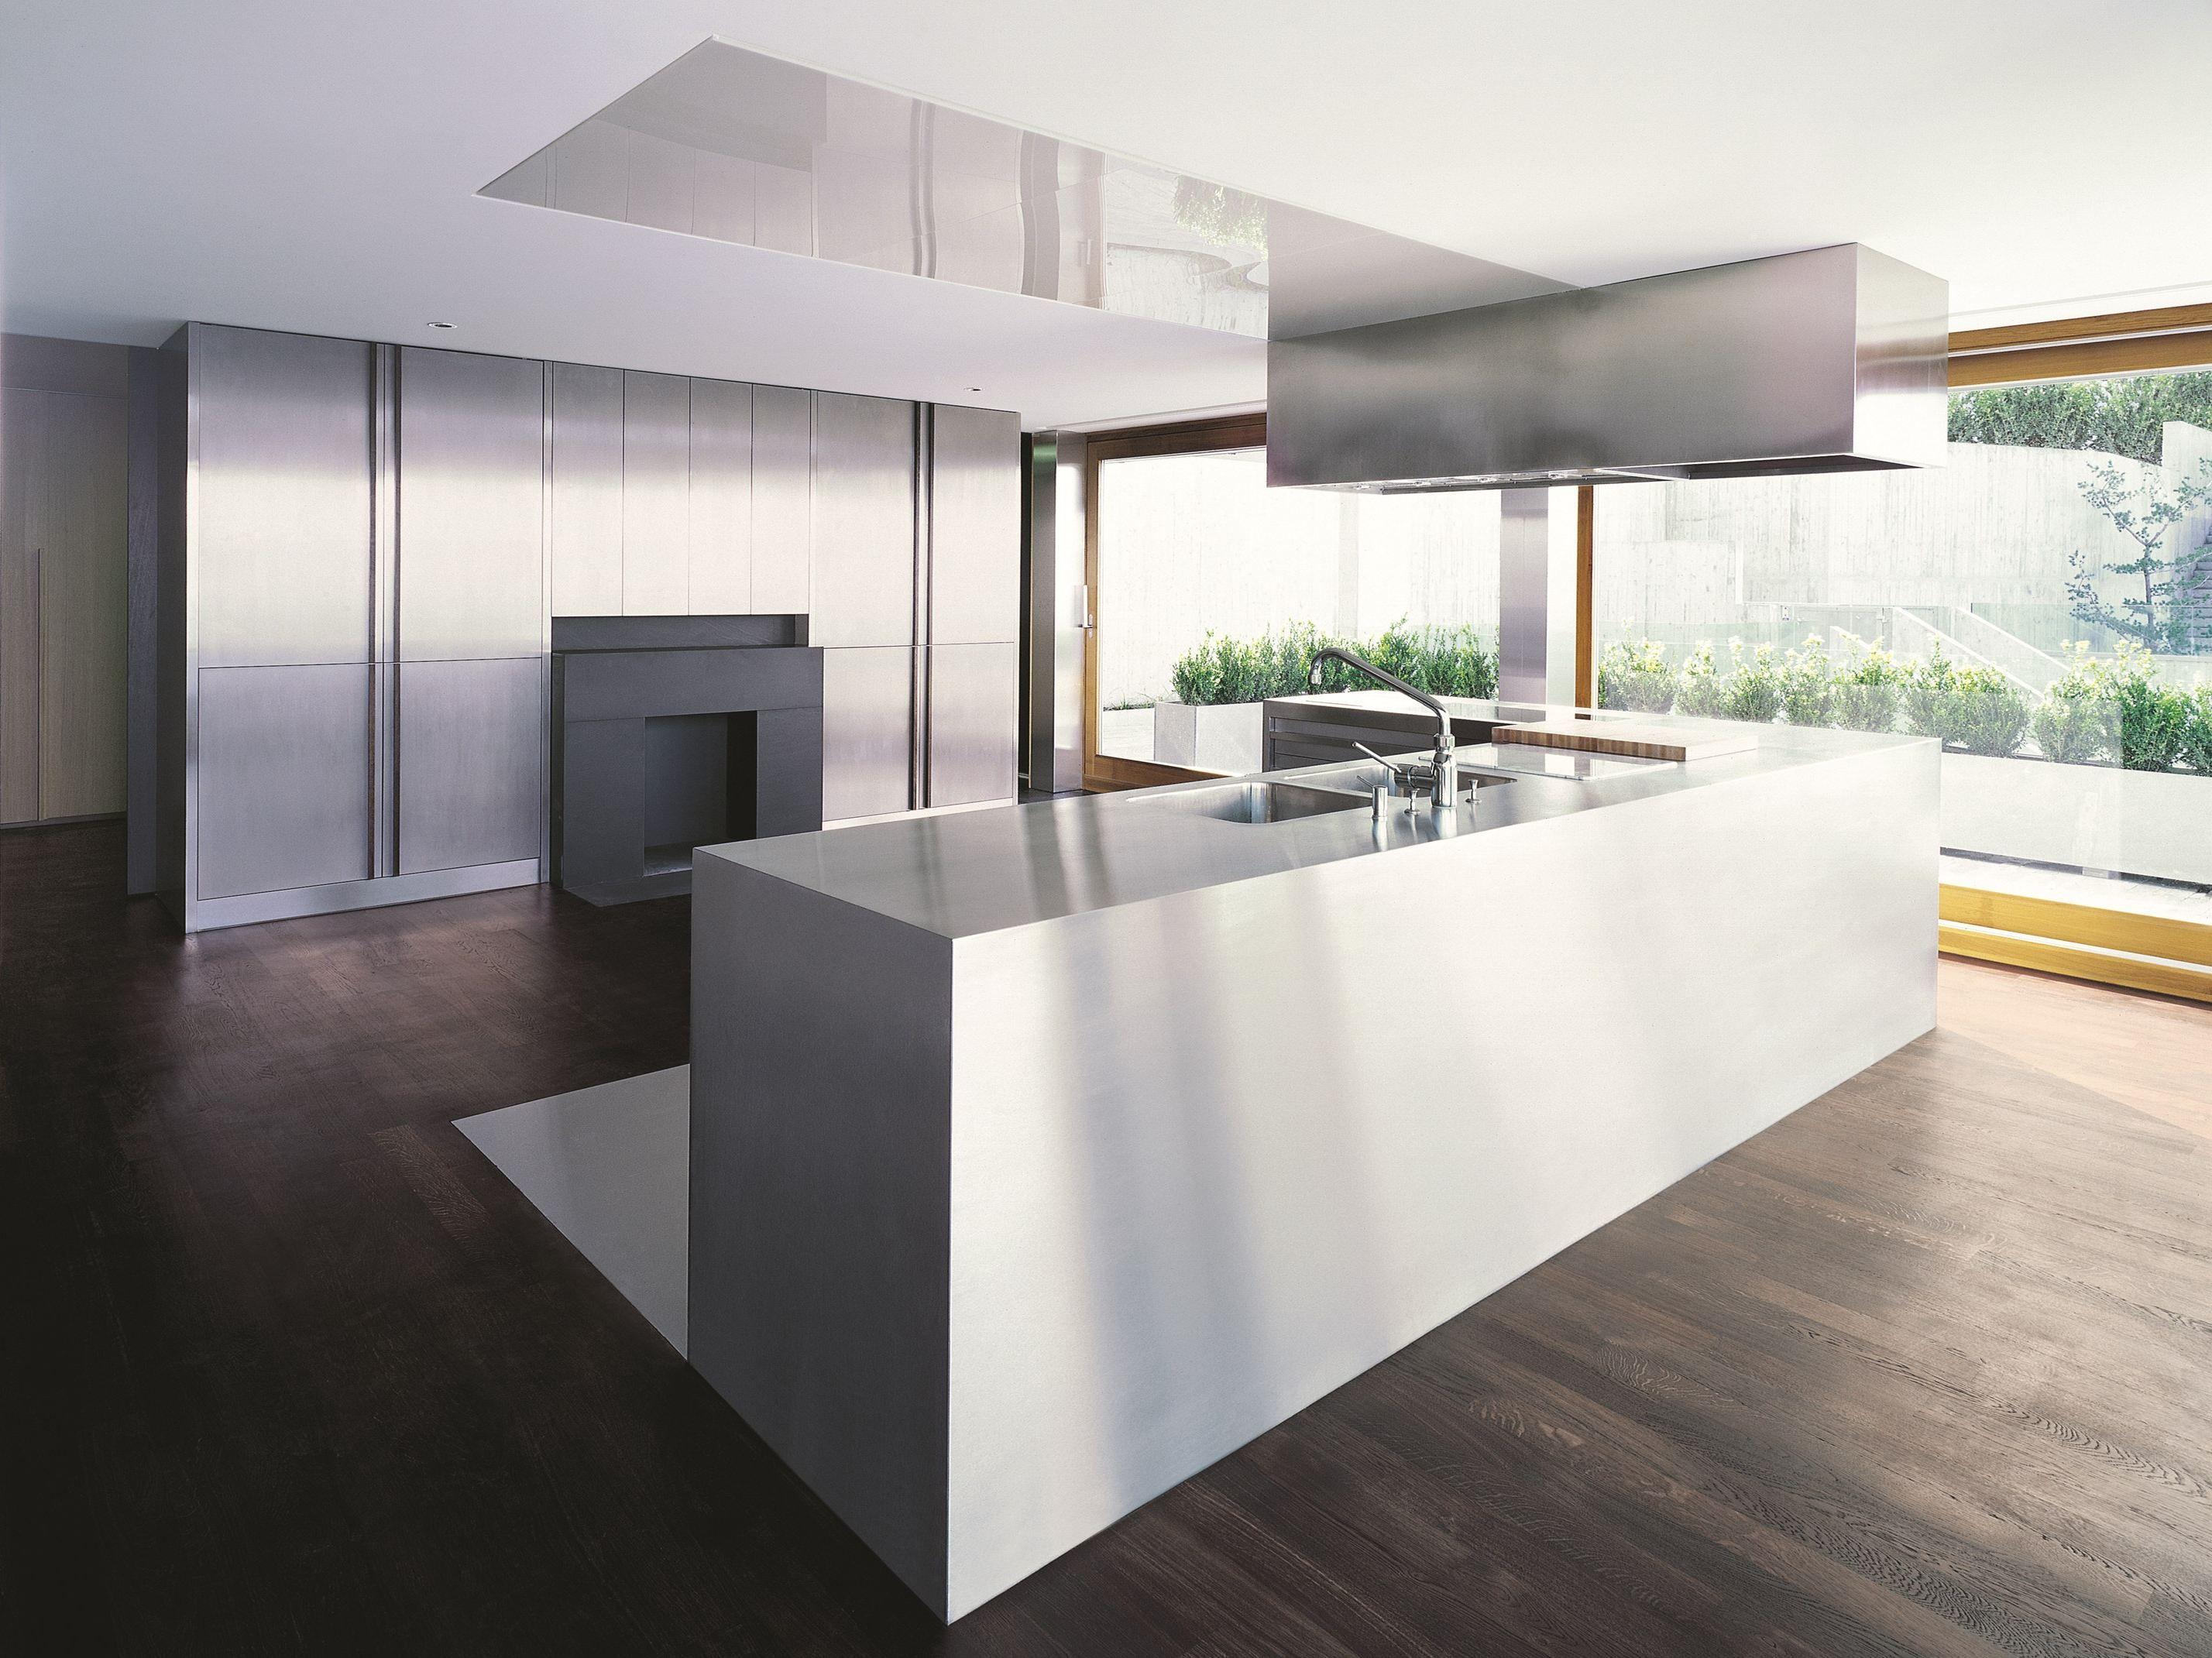 Cucina in acciaio inox npu progr inx by strato cucine - Cucina acciaio inox ...